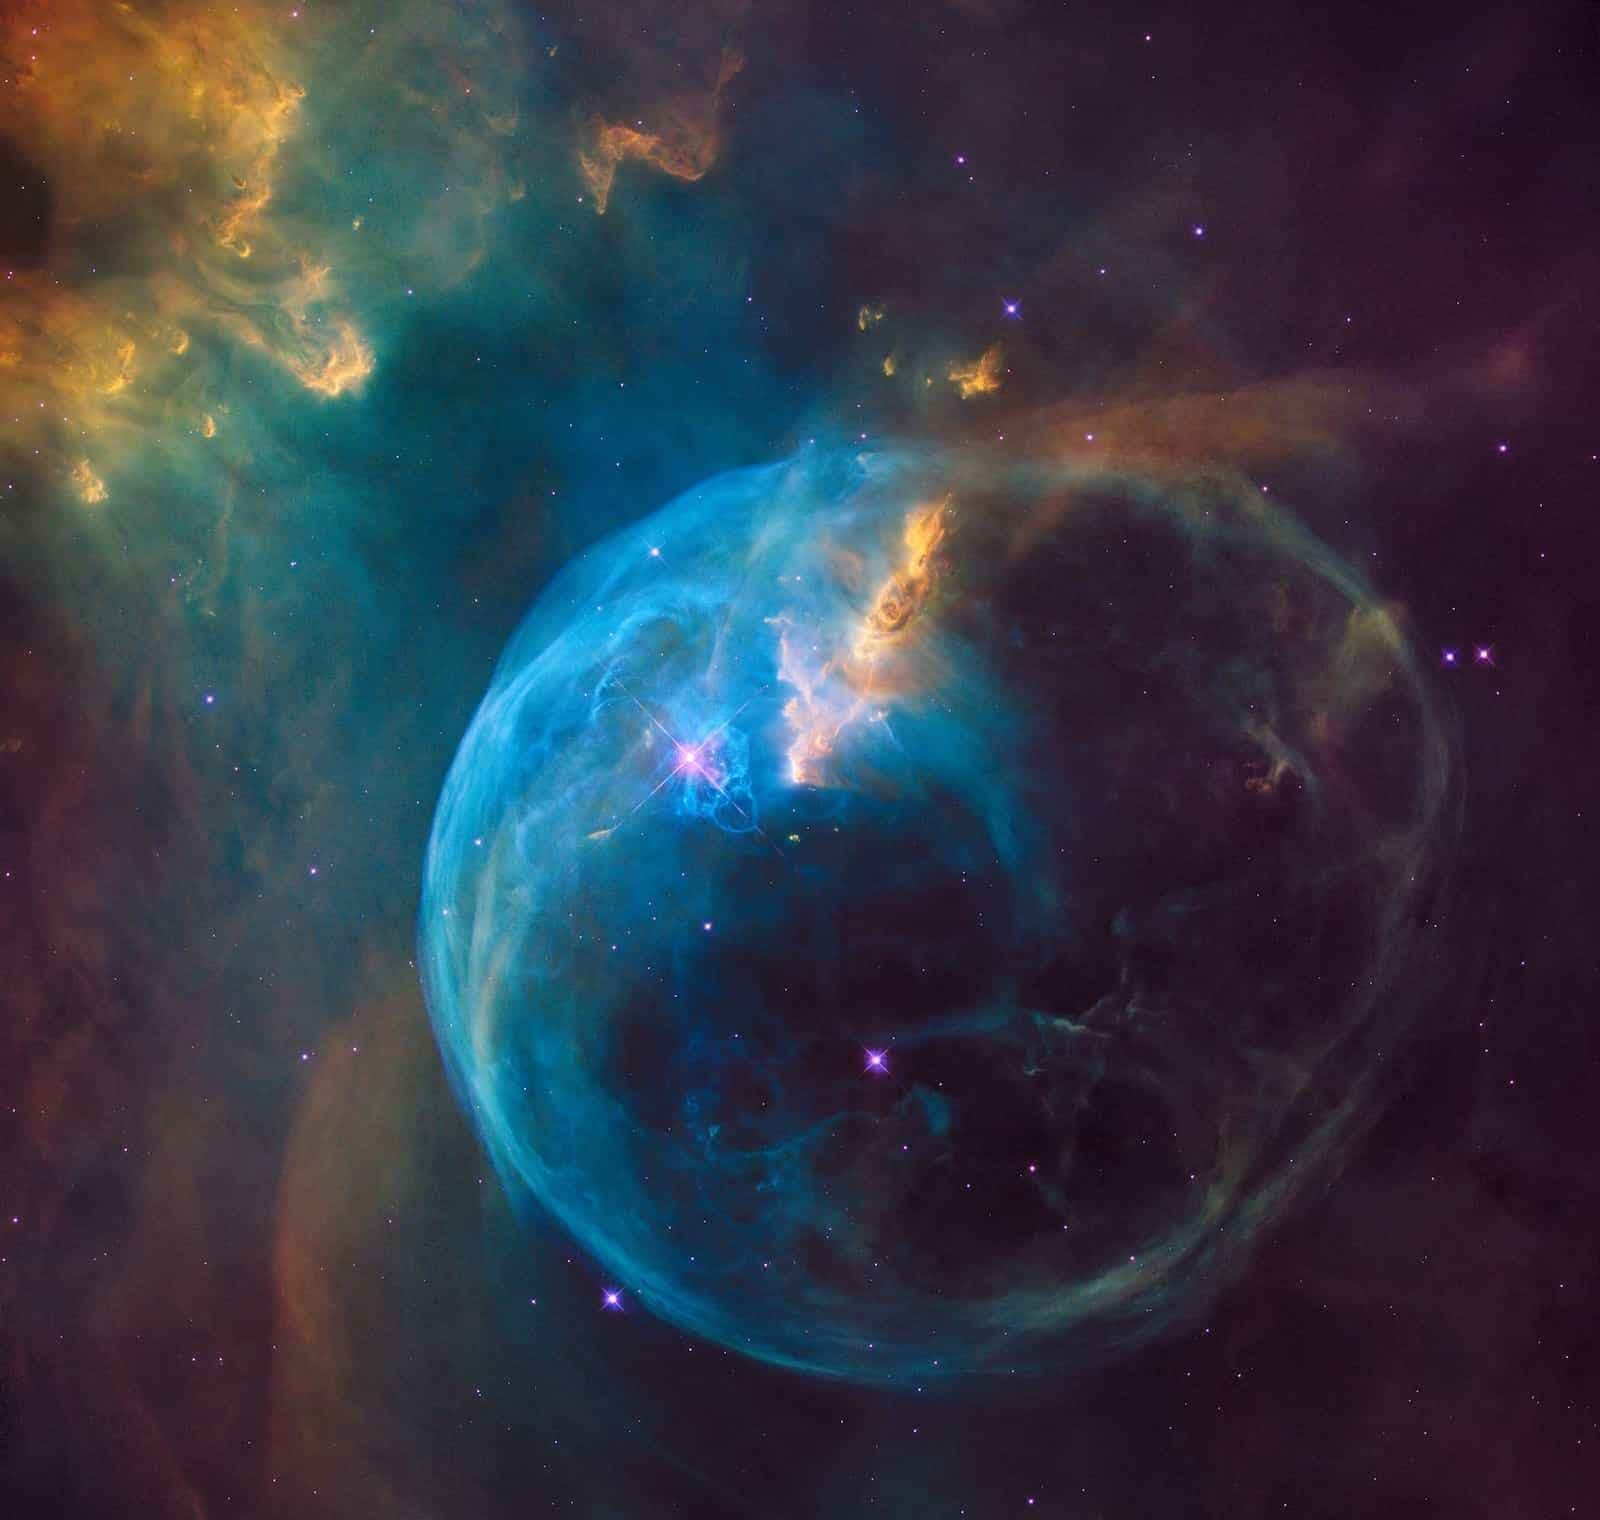 T01xE11: Enigma del origen de la vida | luisbermejo.com